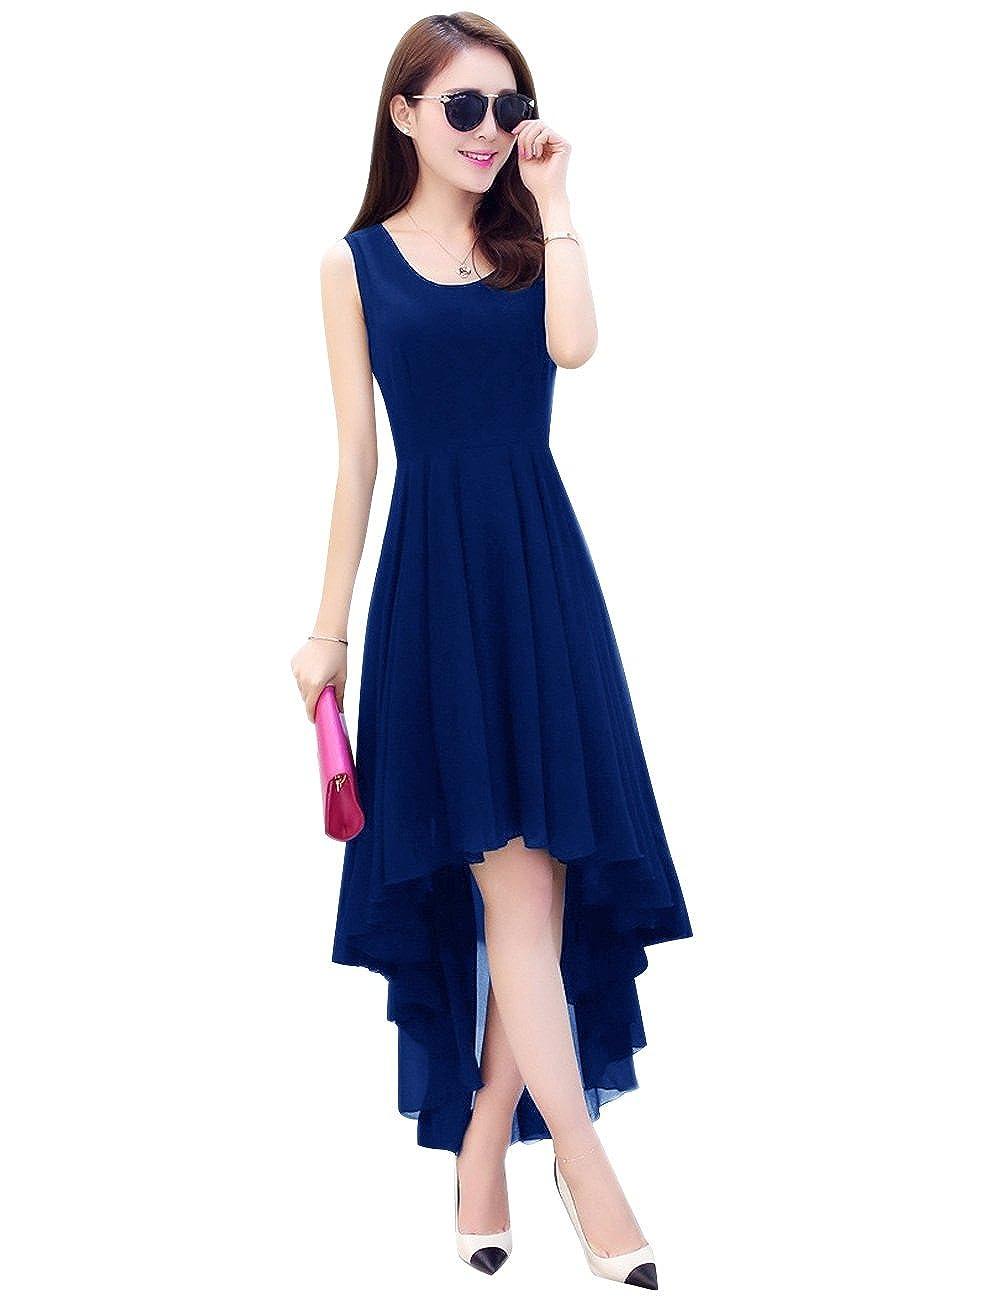 Royal bluee Dasior Women's ALine Asymmetric High Low Summer Beach Holiday Party Dress